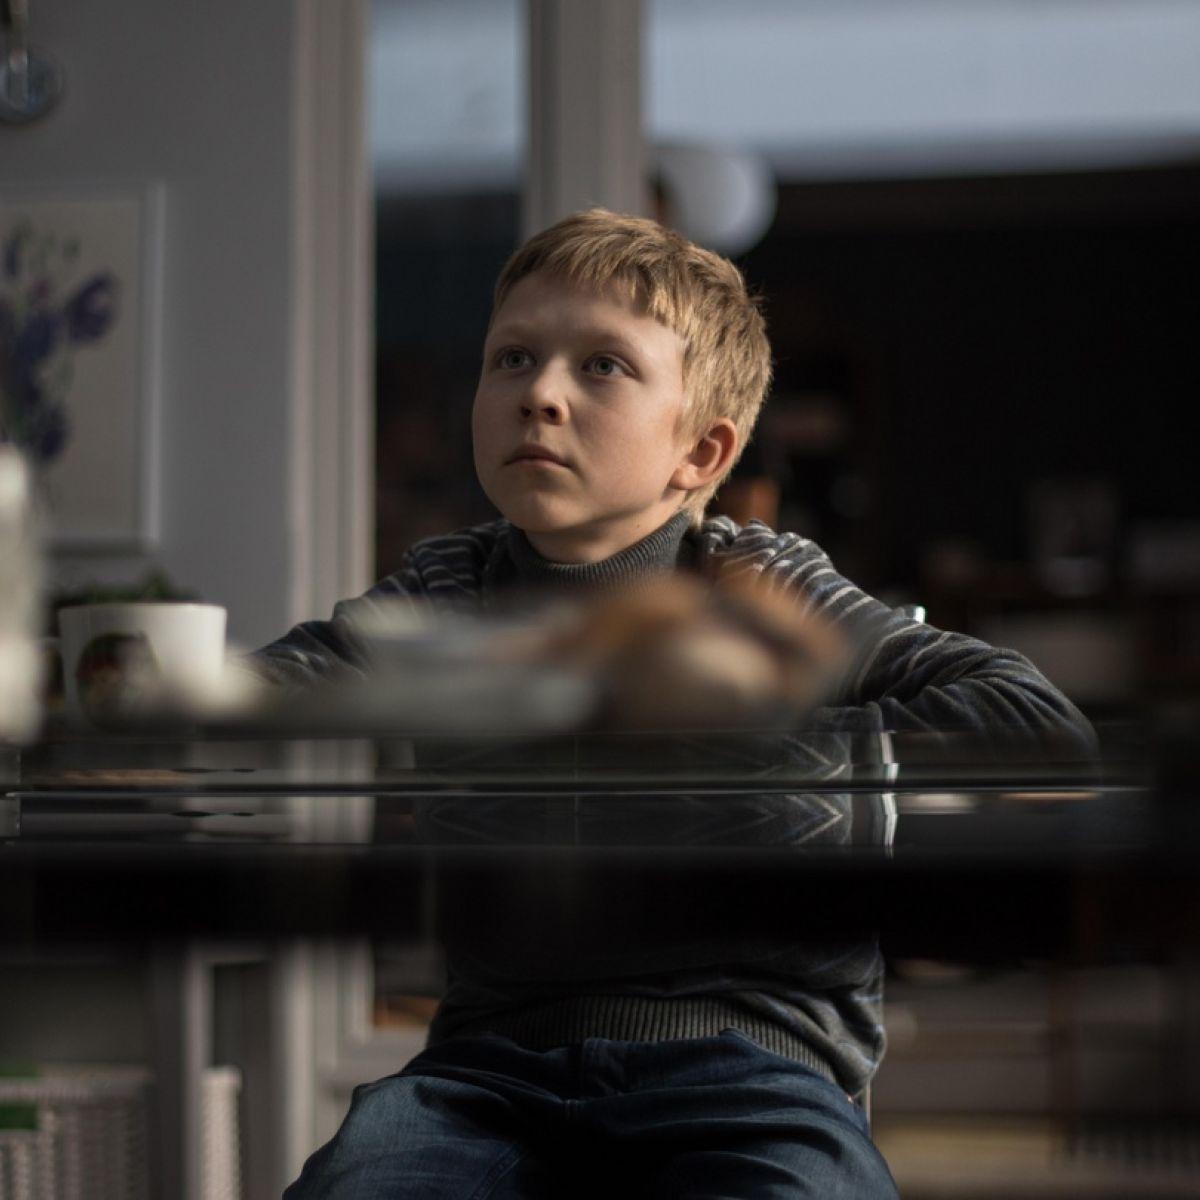 The new film Zvyagintsev received another prestigious award 02.07.2017 81